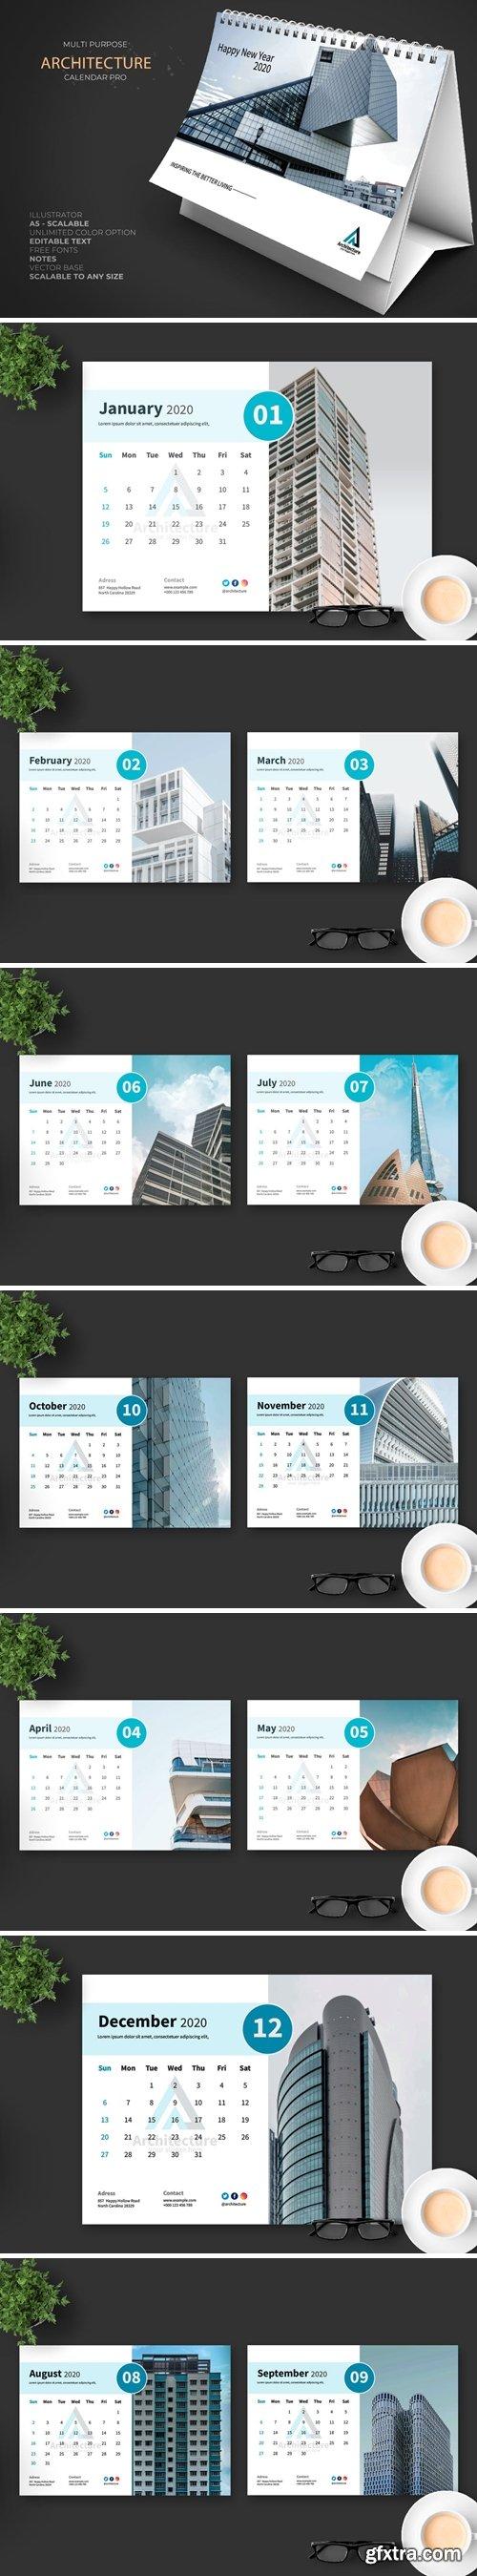 Architect Calendar Pro